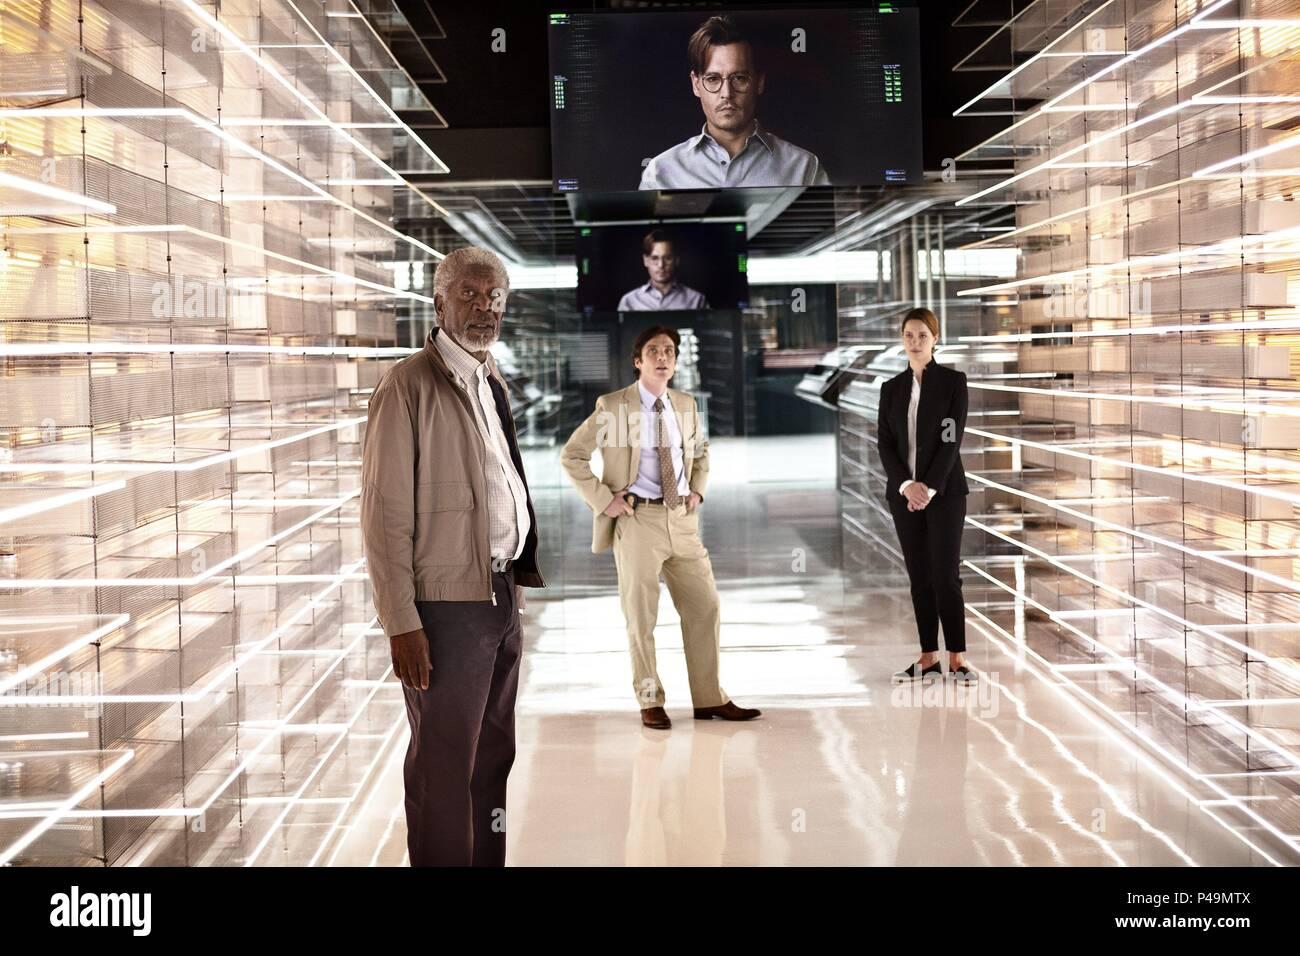 Original Film Title: TRANSCENDENCE.  English Title: TRANSCENDENCE.  Film Director: WALLY PFISTER.  Year: 2014.  Stars: MORGAN FREEMAN; JOHNNY DEPP; CILLIAN MURPHY; REBECCA HALL. Credit: ALCON ENTERTAIMENT / Album - Stock Image